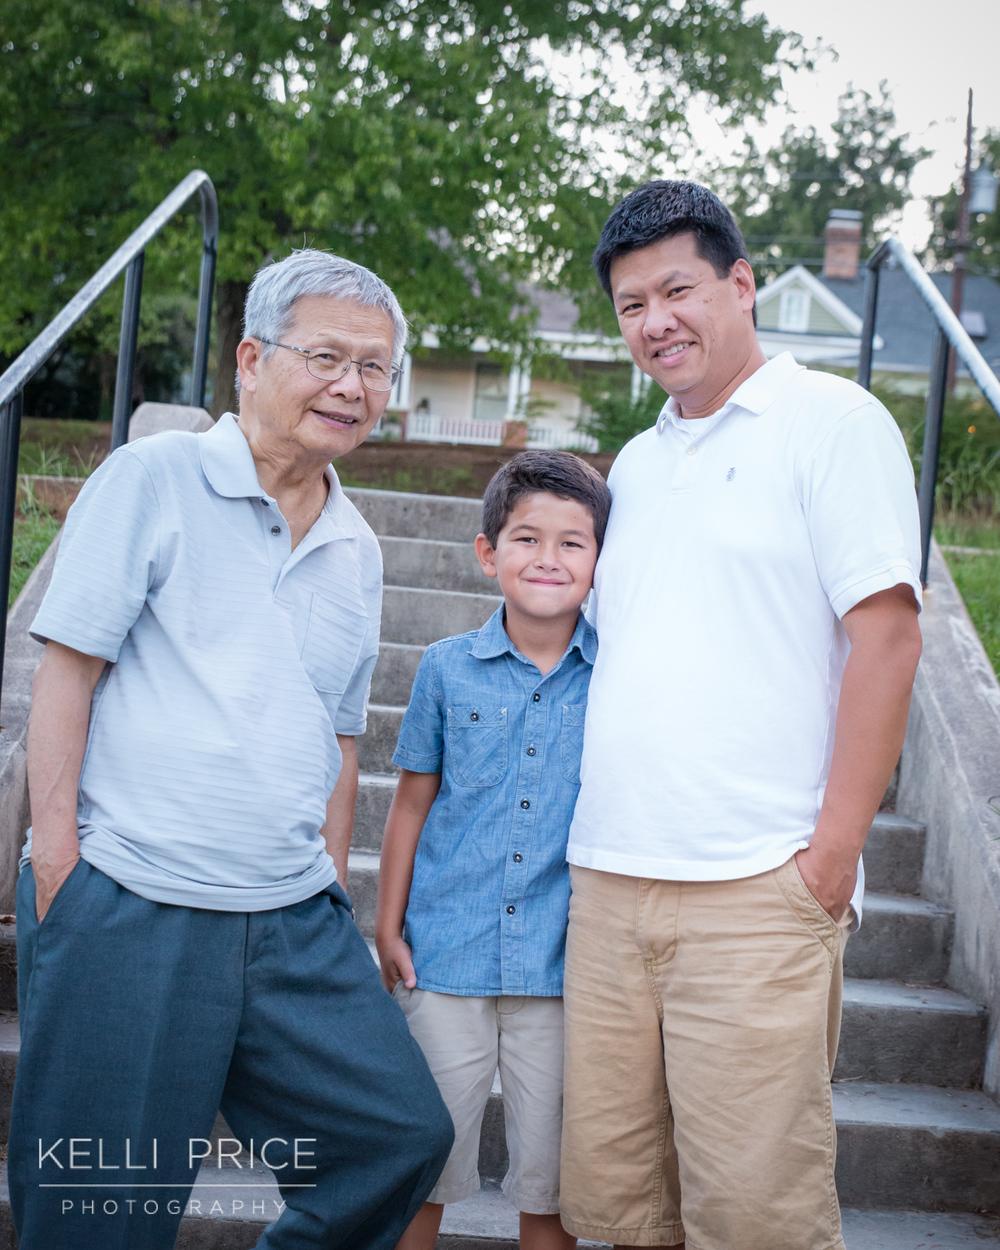 3 Generations of Men, Professional Family Session, Atlanta, GA